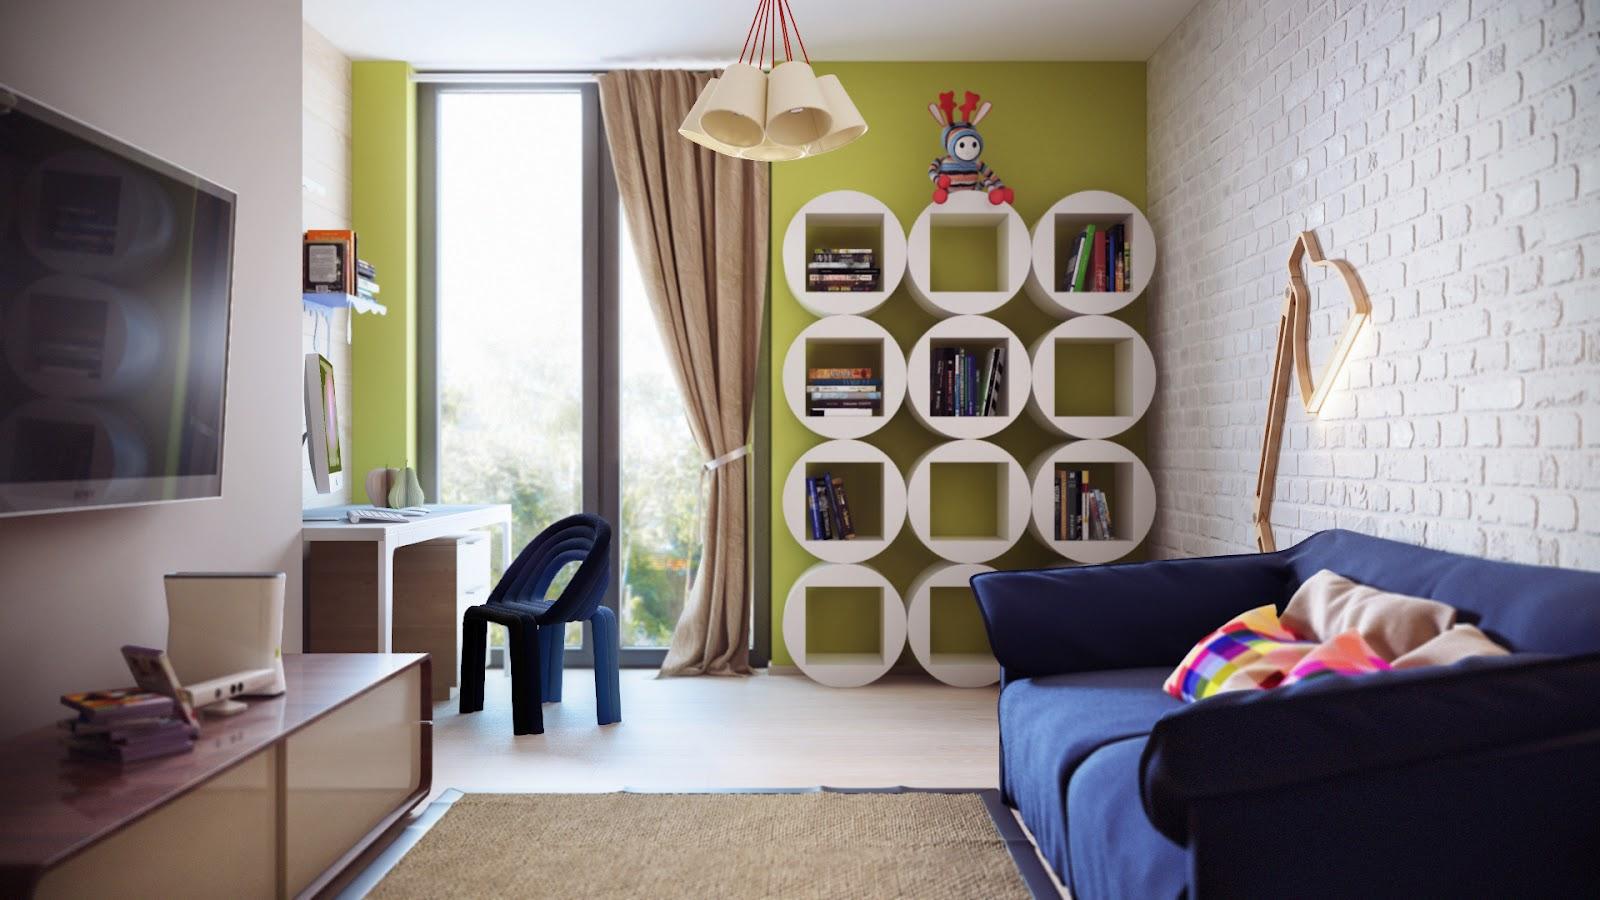 ruang+keluarga+modern Desain Rumah Modern Dari Karya Brilian Arsitektur Uglyanitsa Alexander